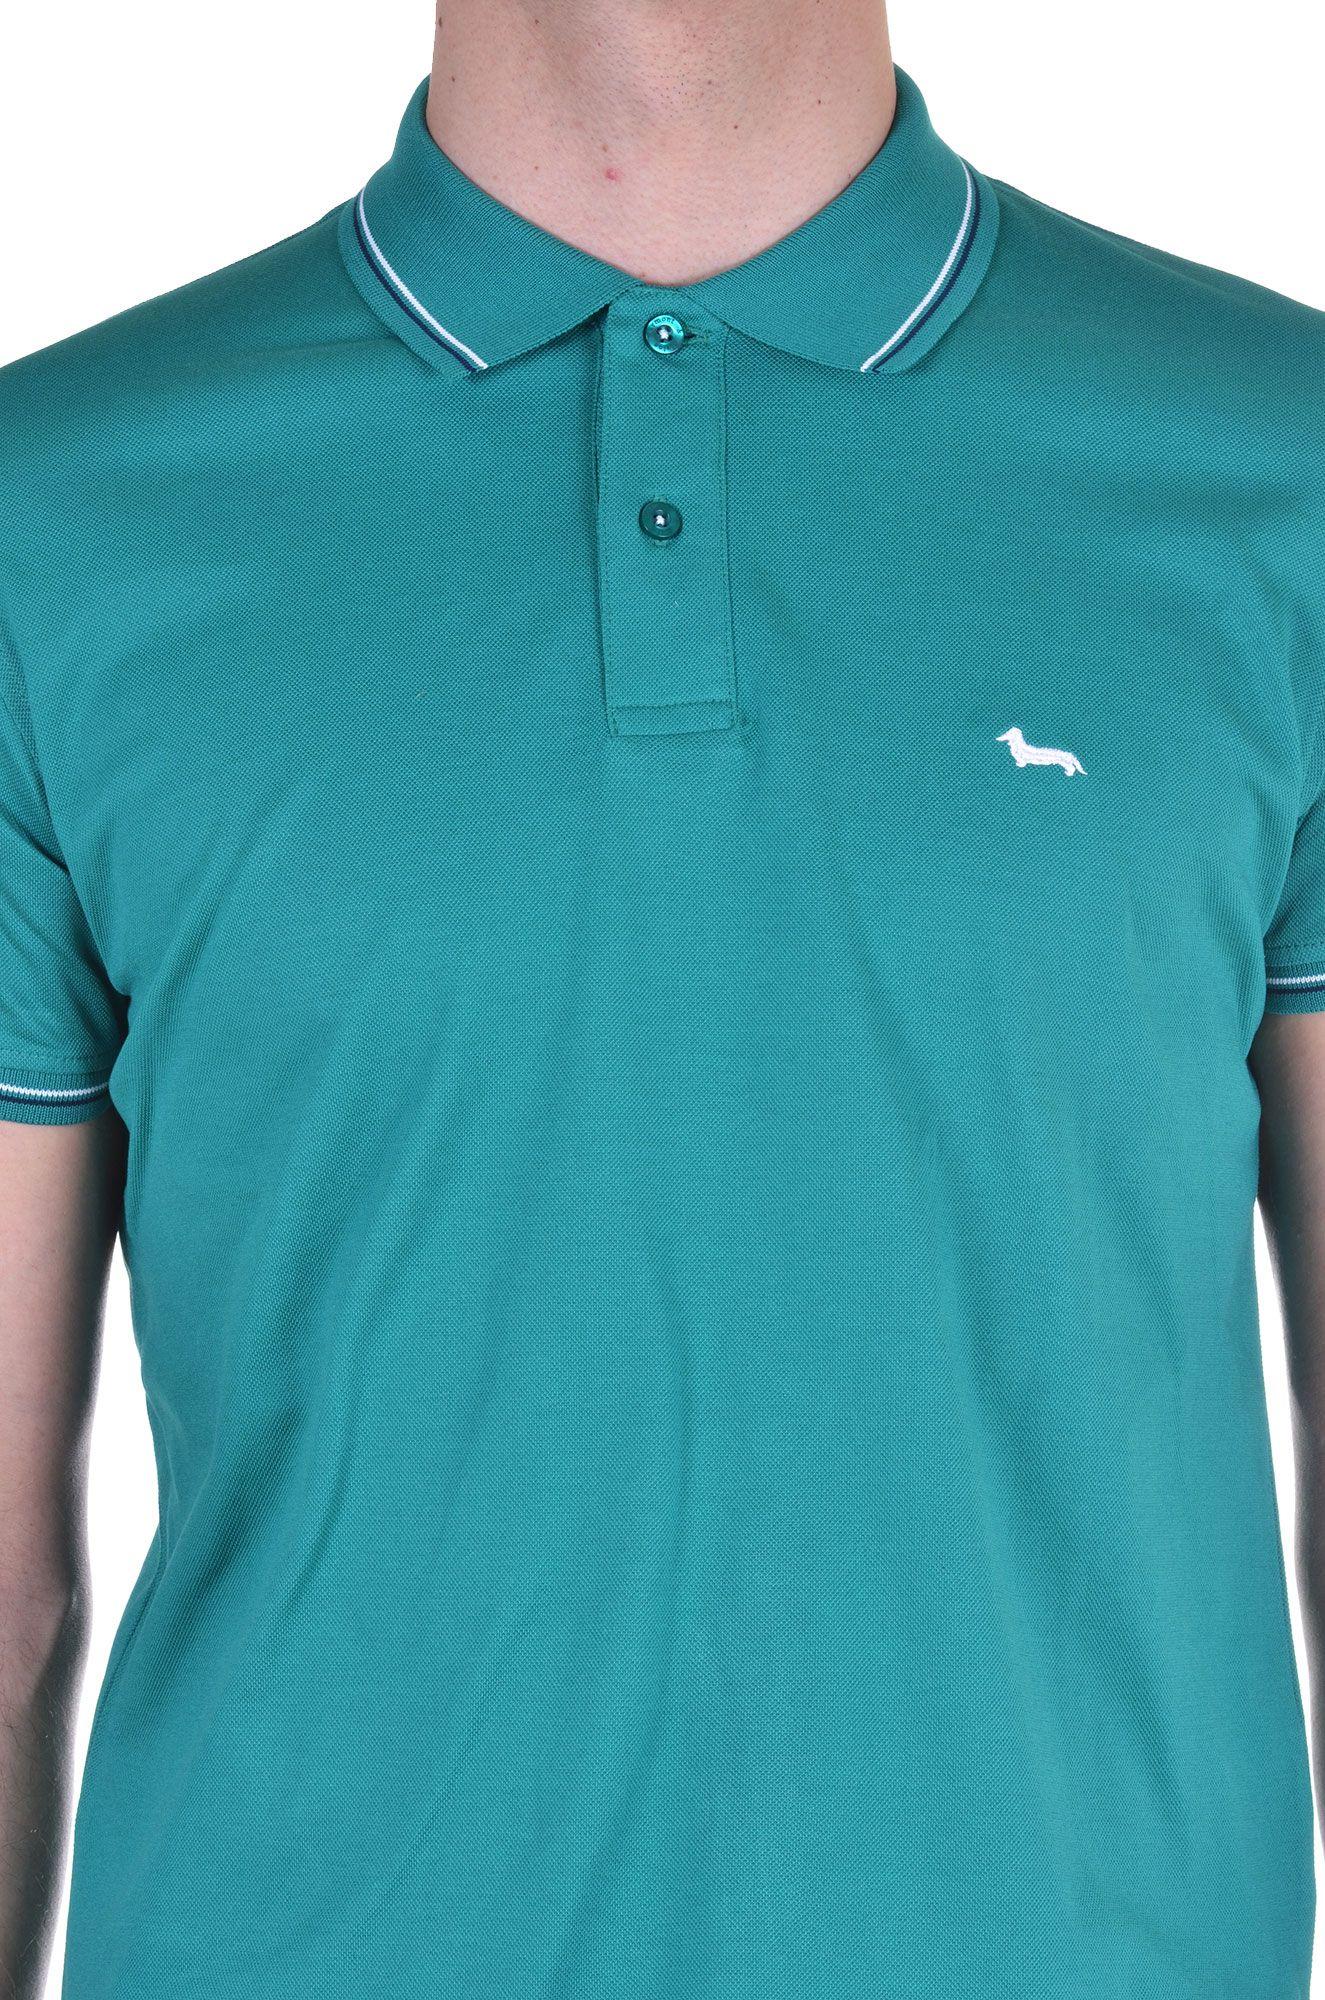 Harmont blaine polo shirts on kamiceria http www for Name brand golf shirts